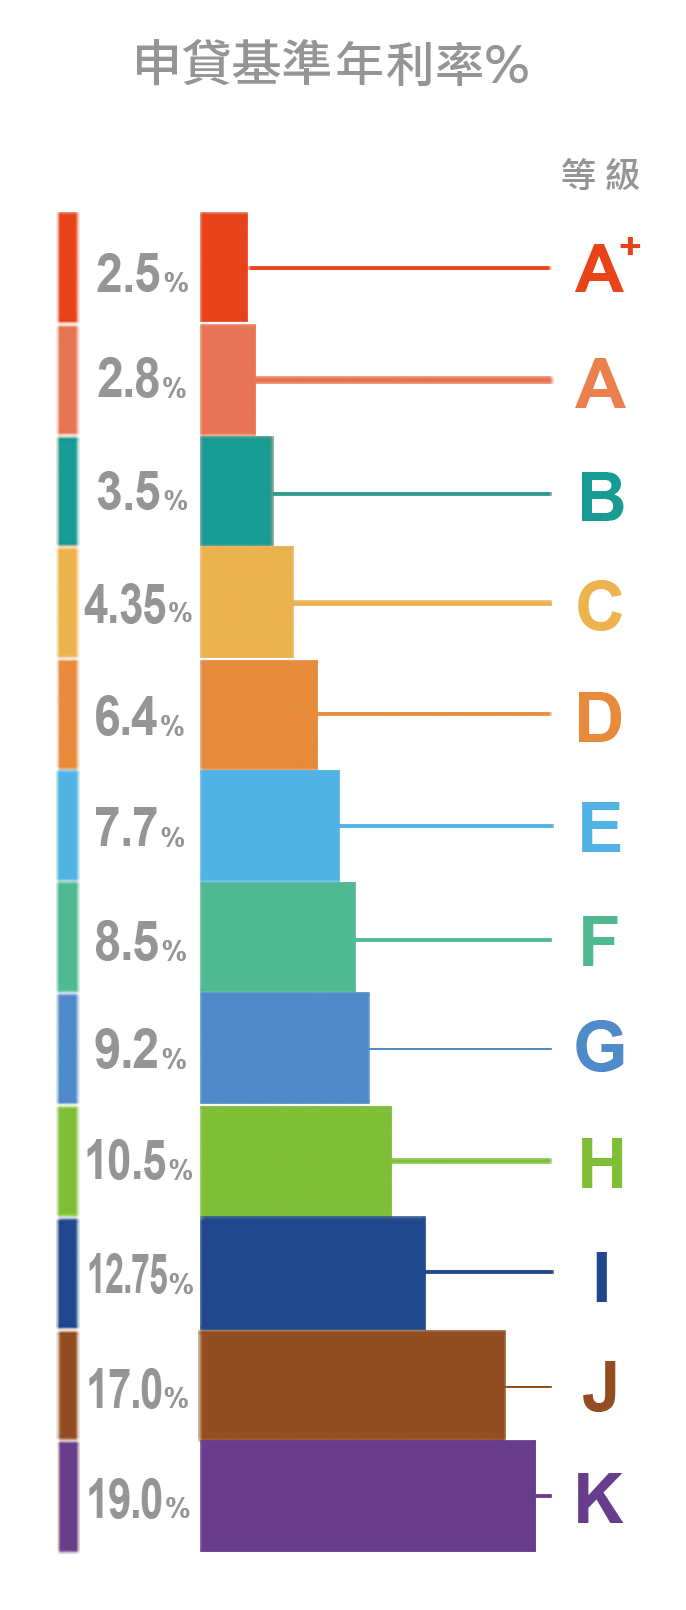 LnB信用評等從A+到K一共12個等級